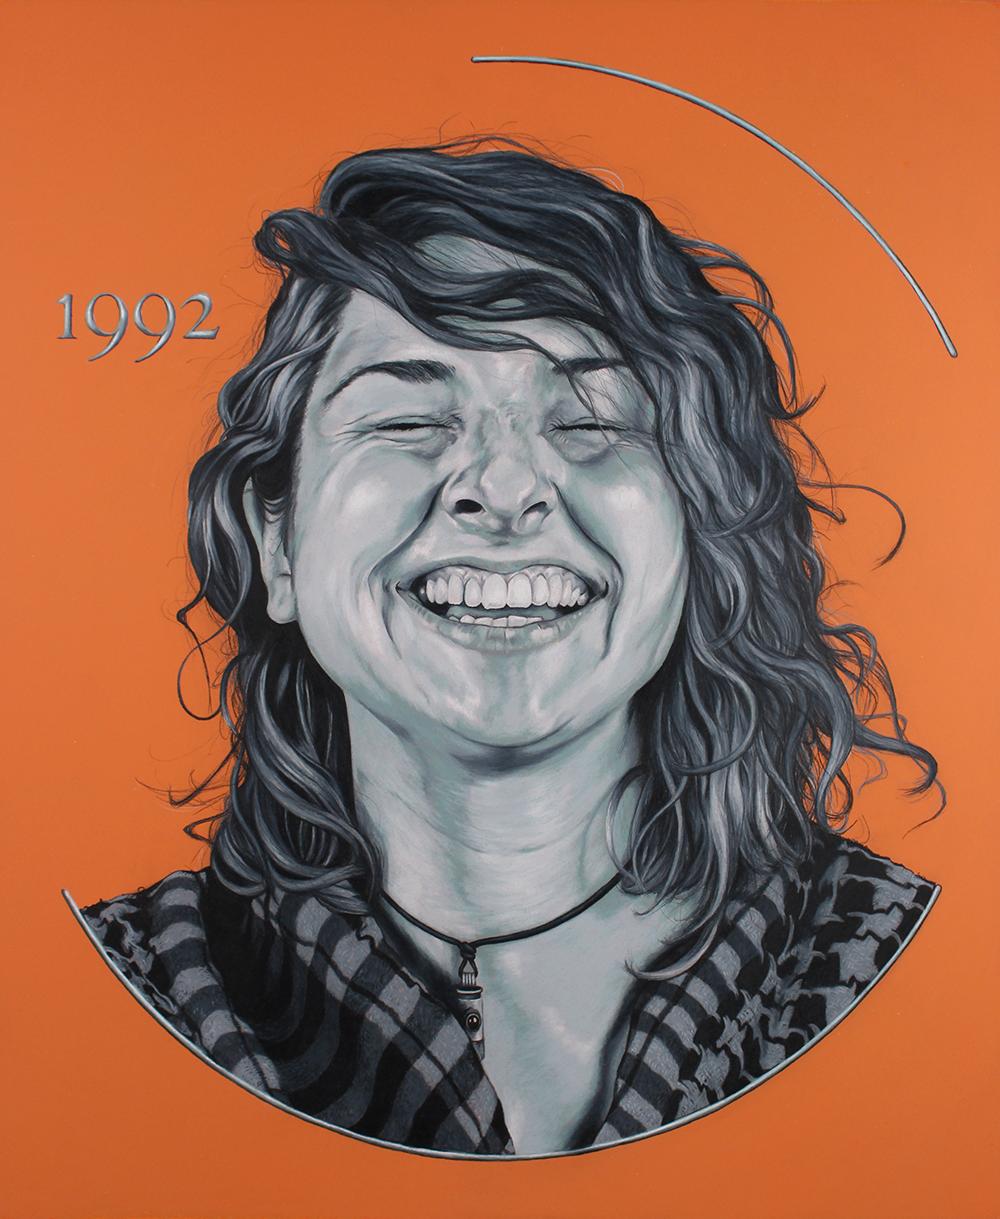 Julia-1992